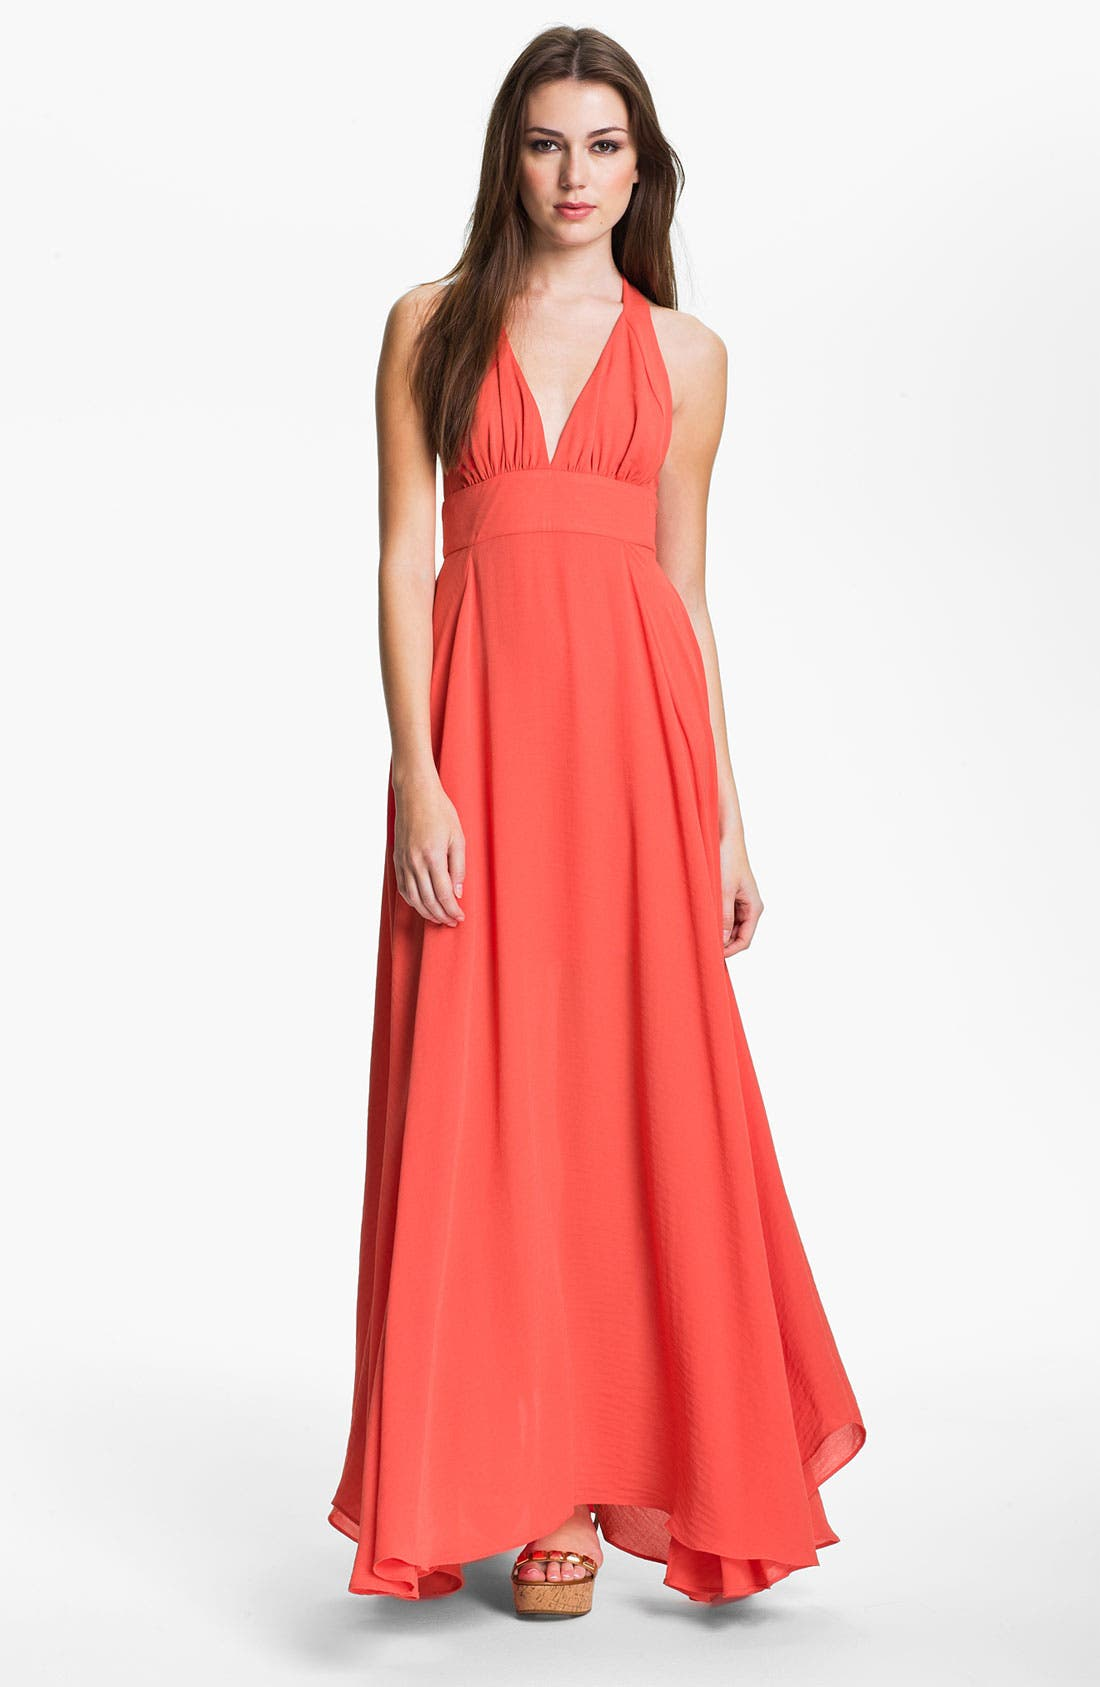 Alternate Image 1 Selected - Abi Ferrin 'Goldie' V-Neck Halter Maxi Dress